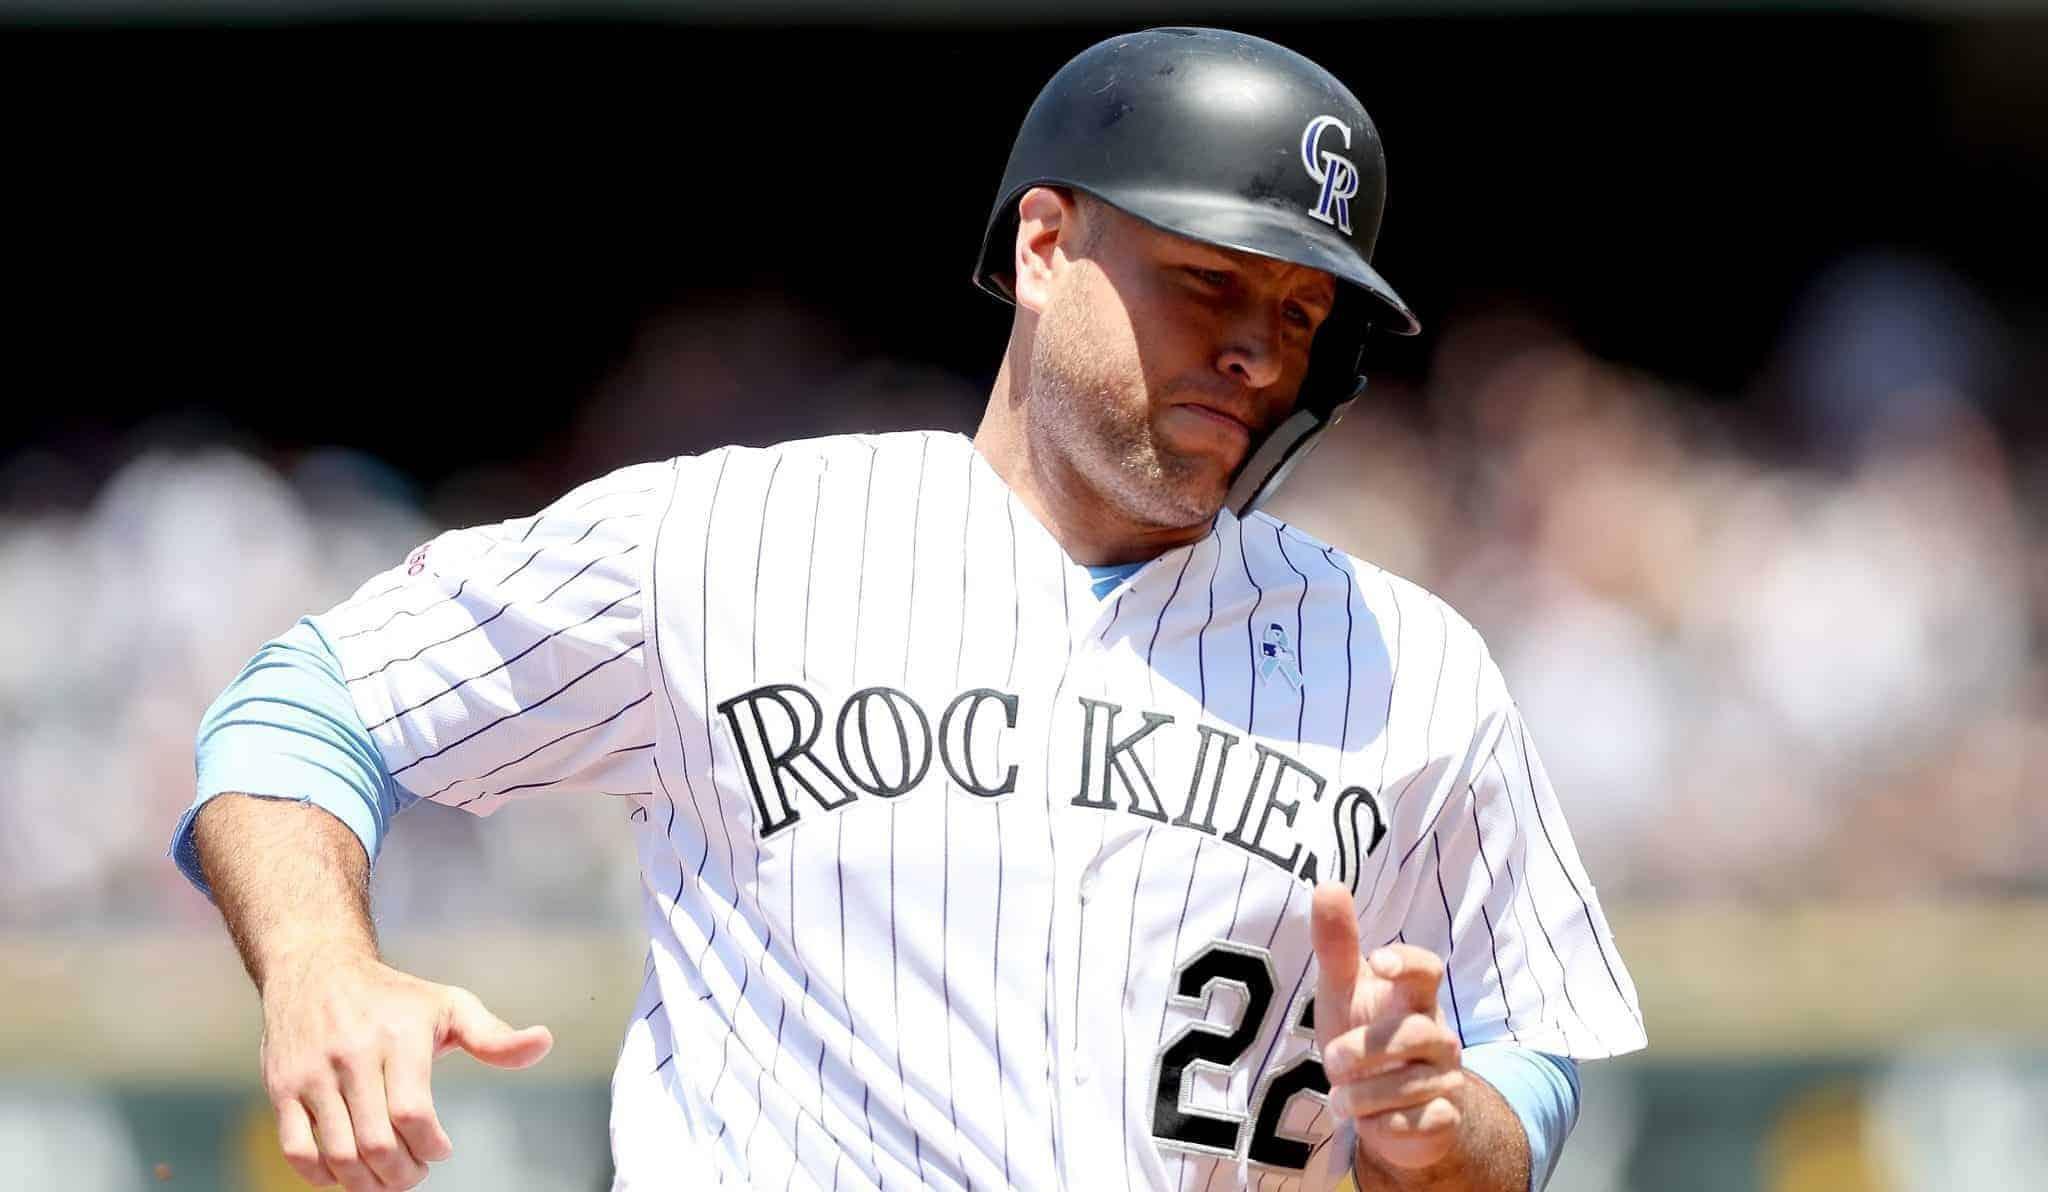 New York Yankees news: Team sign Chris Iannetta to minor-league deal